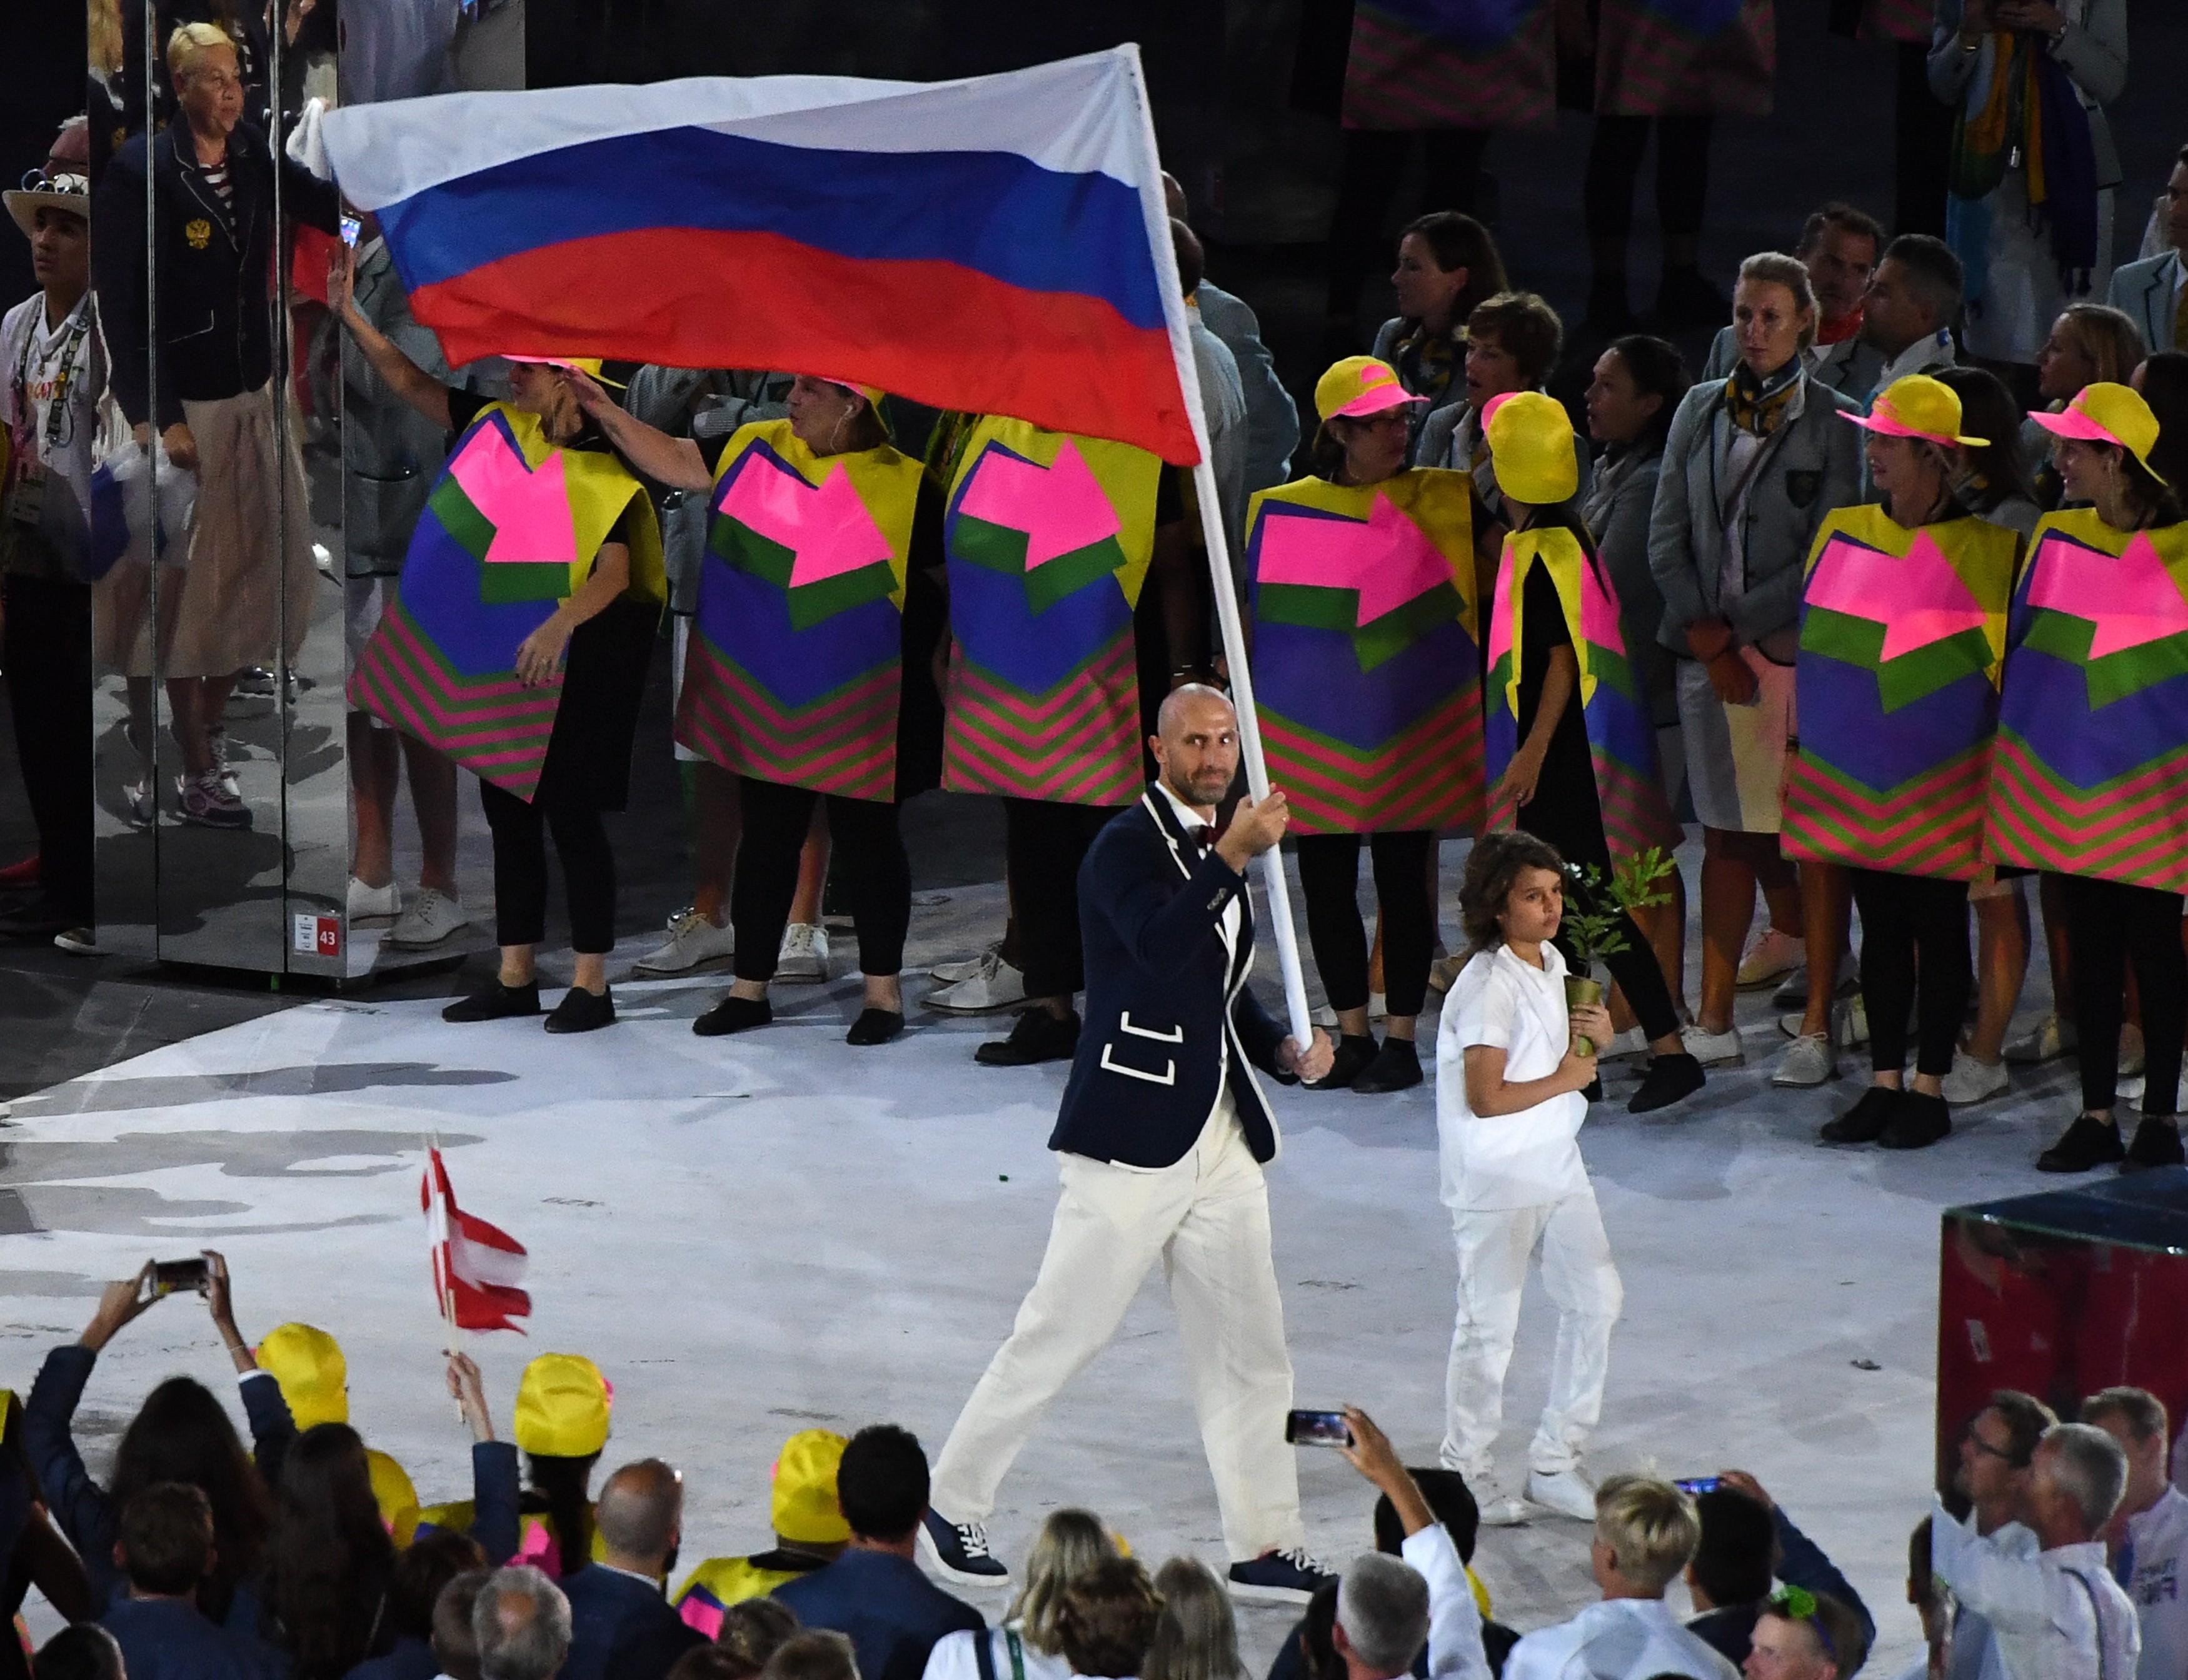 Сергей Тетюхин — знаменосец олимпийской сборной России в Рио-2016. Фото: © РИА Новости/Александр Вильф